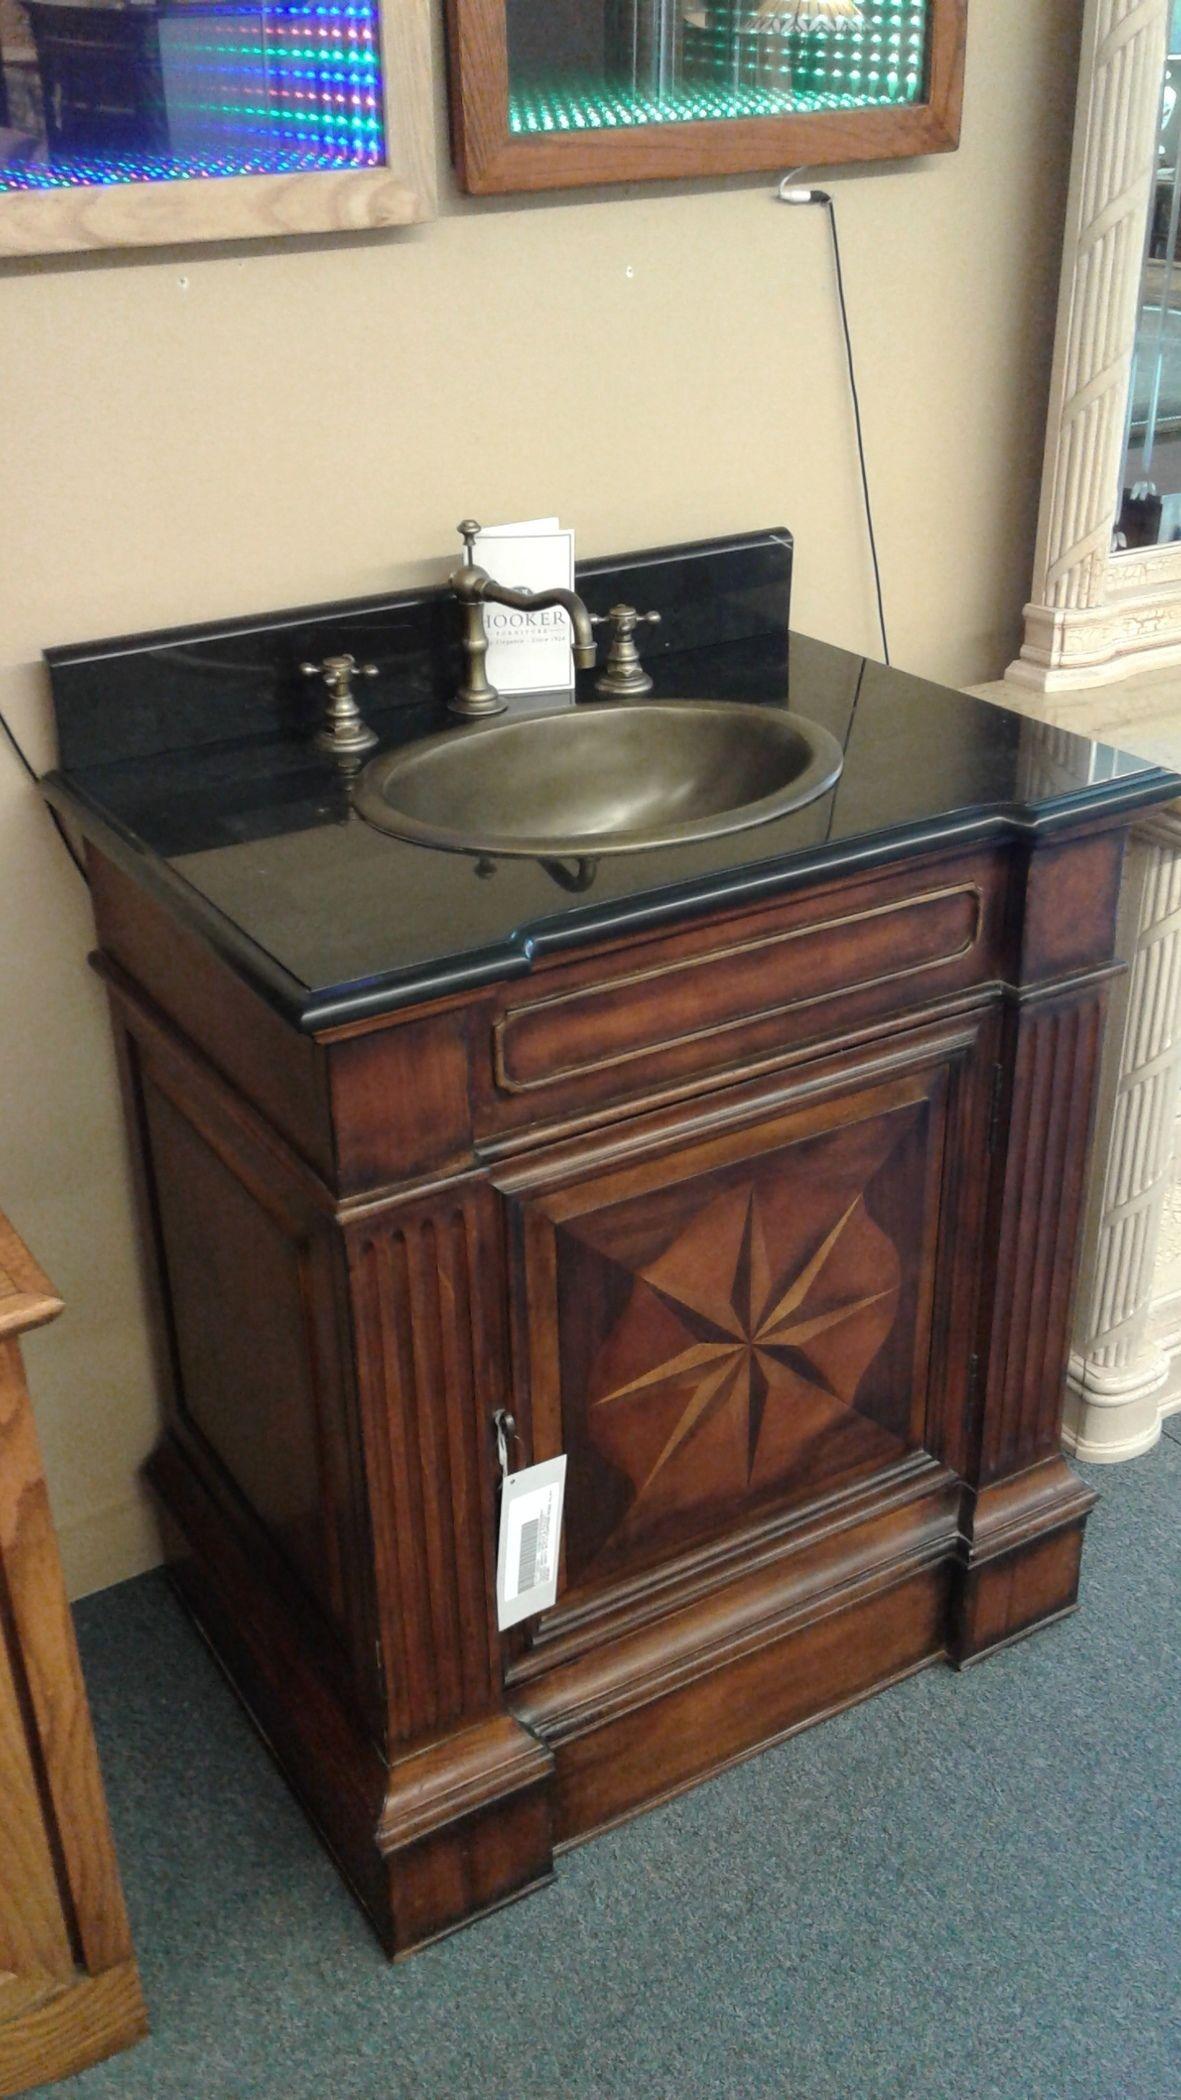 Hooker Vanity W Sink Faucet Delmarva Furniture Consignment